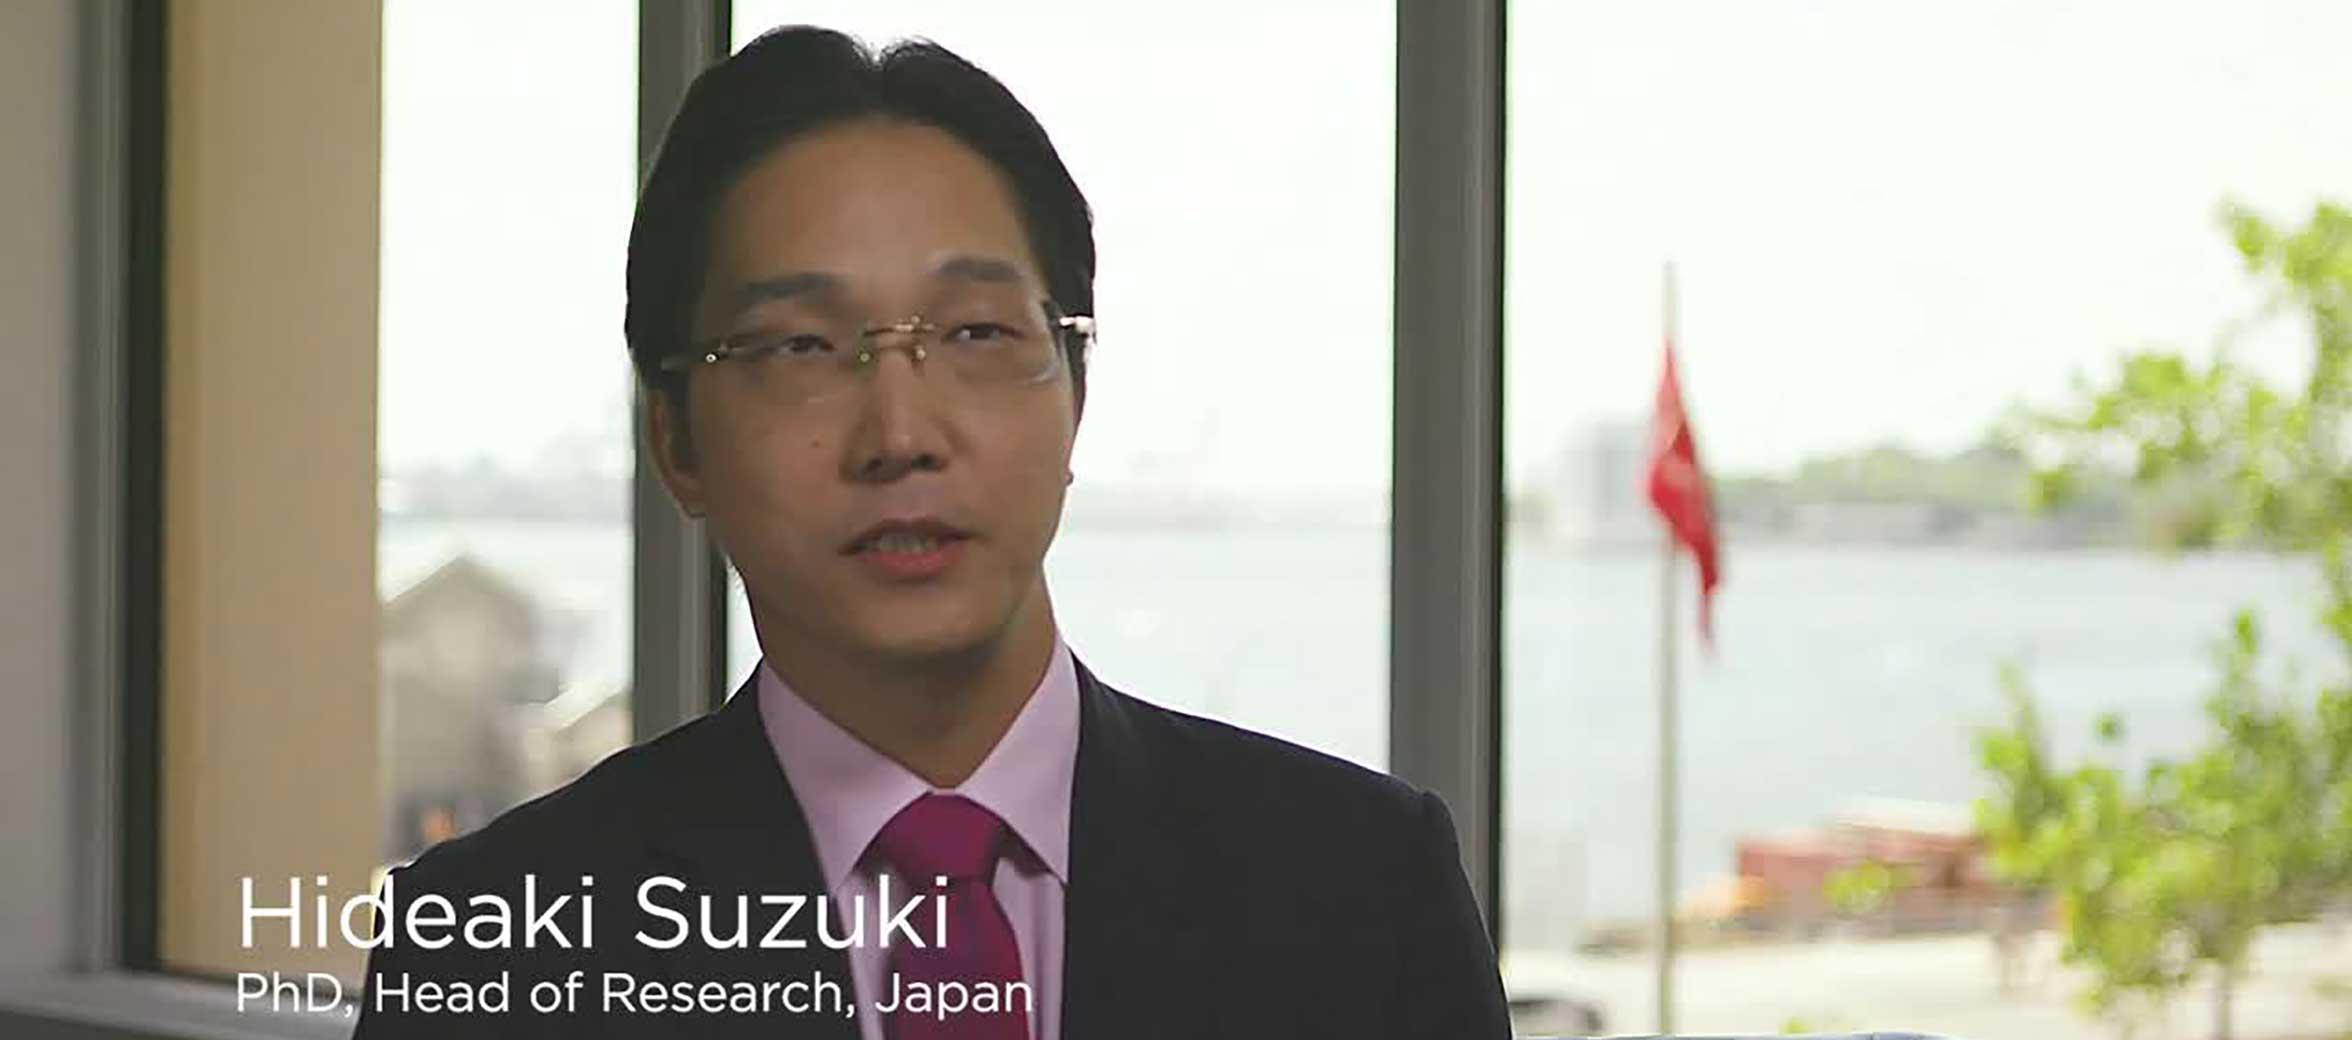 Hideaki Suzuki (image)